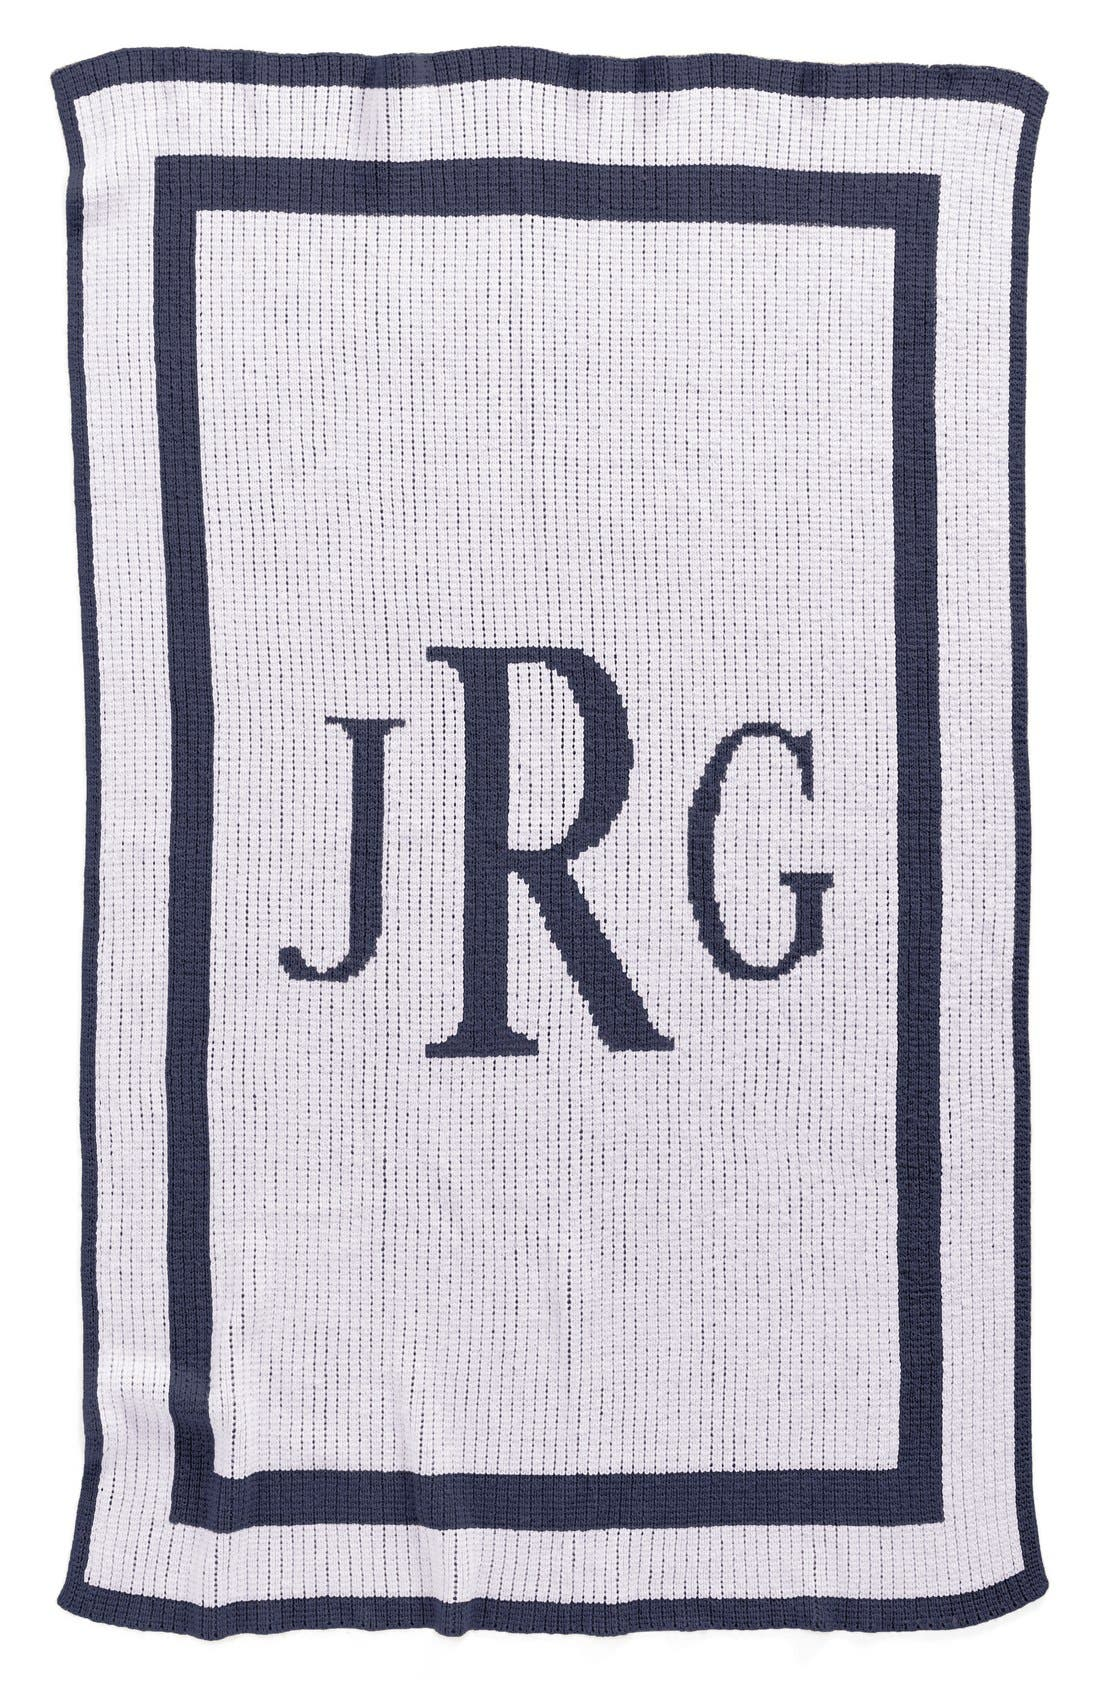 'Classic Monogram' Personalized Crib Blanket,                             Main thumbnail 1, color,                             NAVY/ WHITE